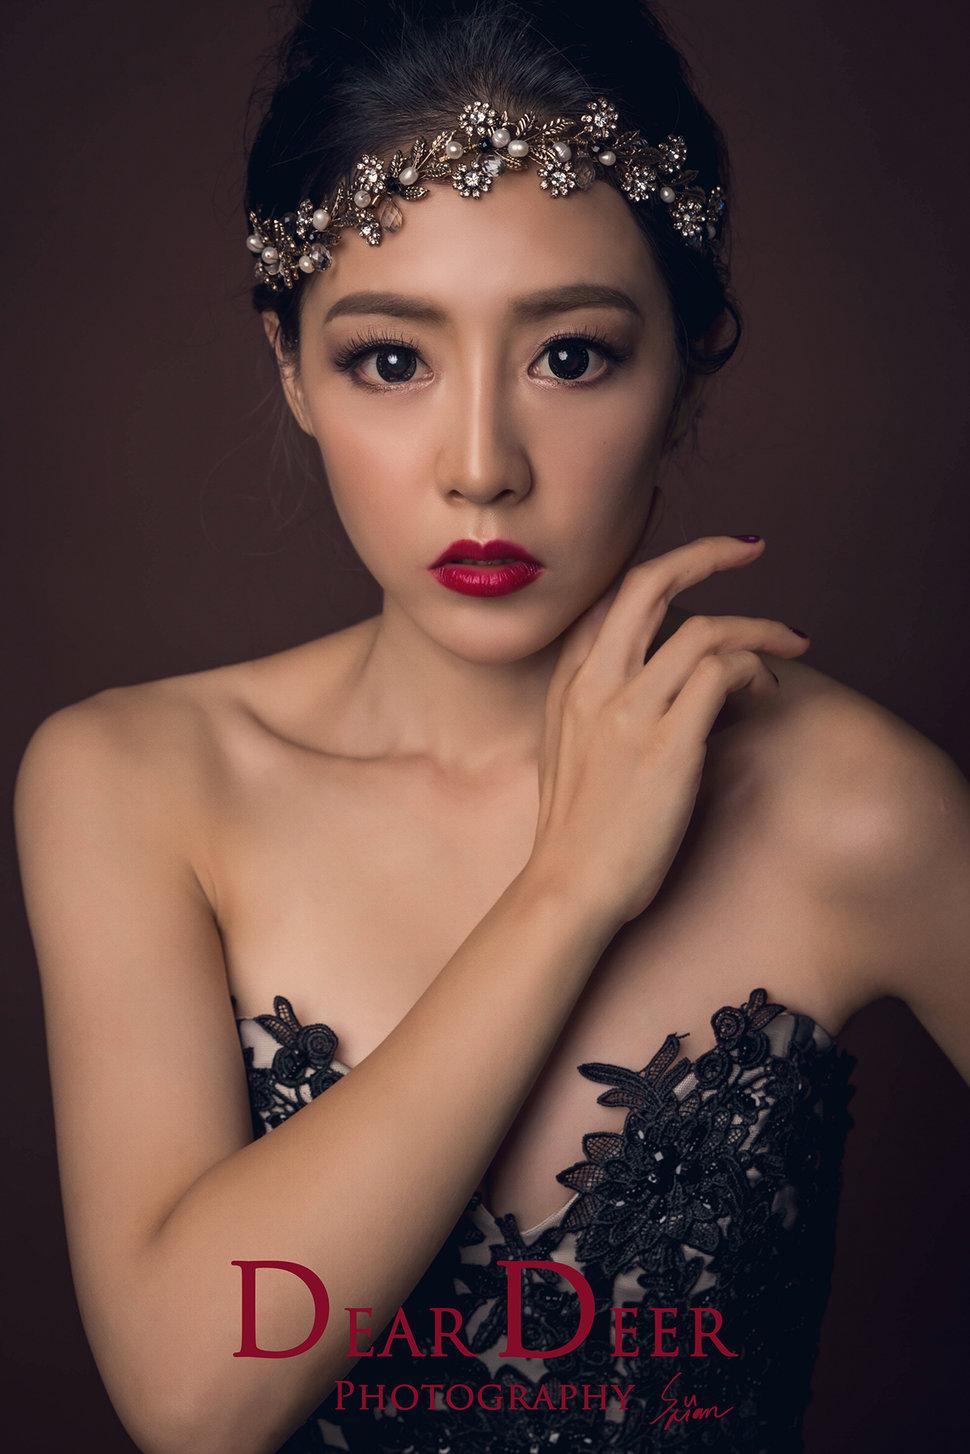 Dear Deer|經典韓系棚拍(編號:2403900) - Dear Deer鹿兒攝影|女攝影師蘇蔓 - 結婚吧